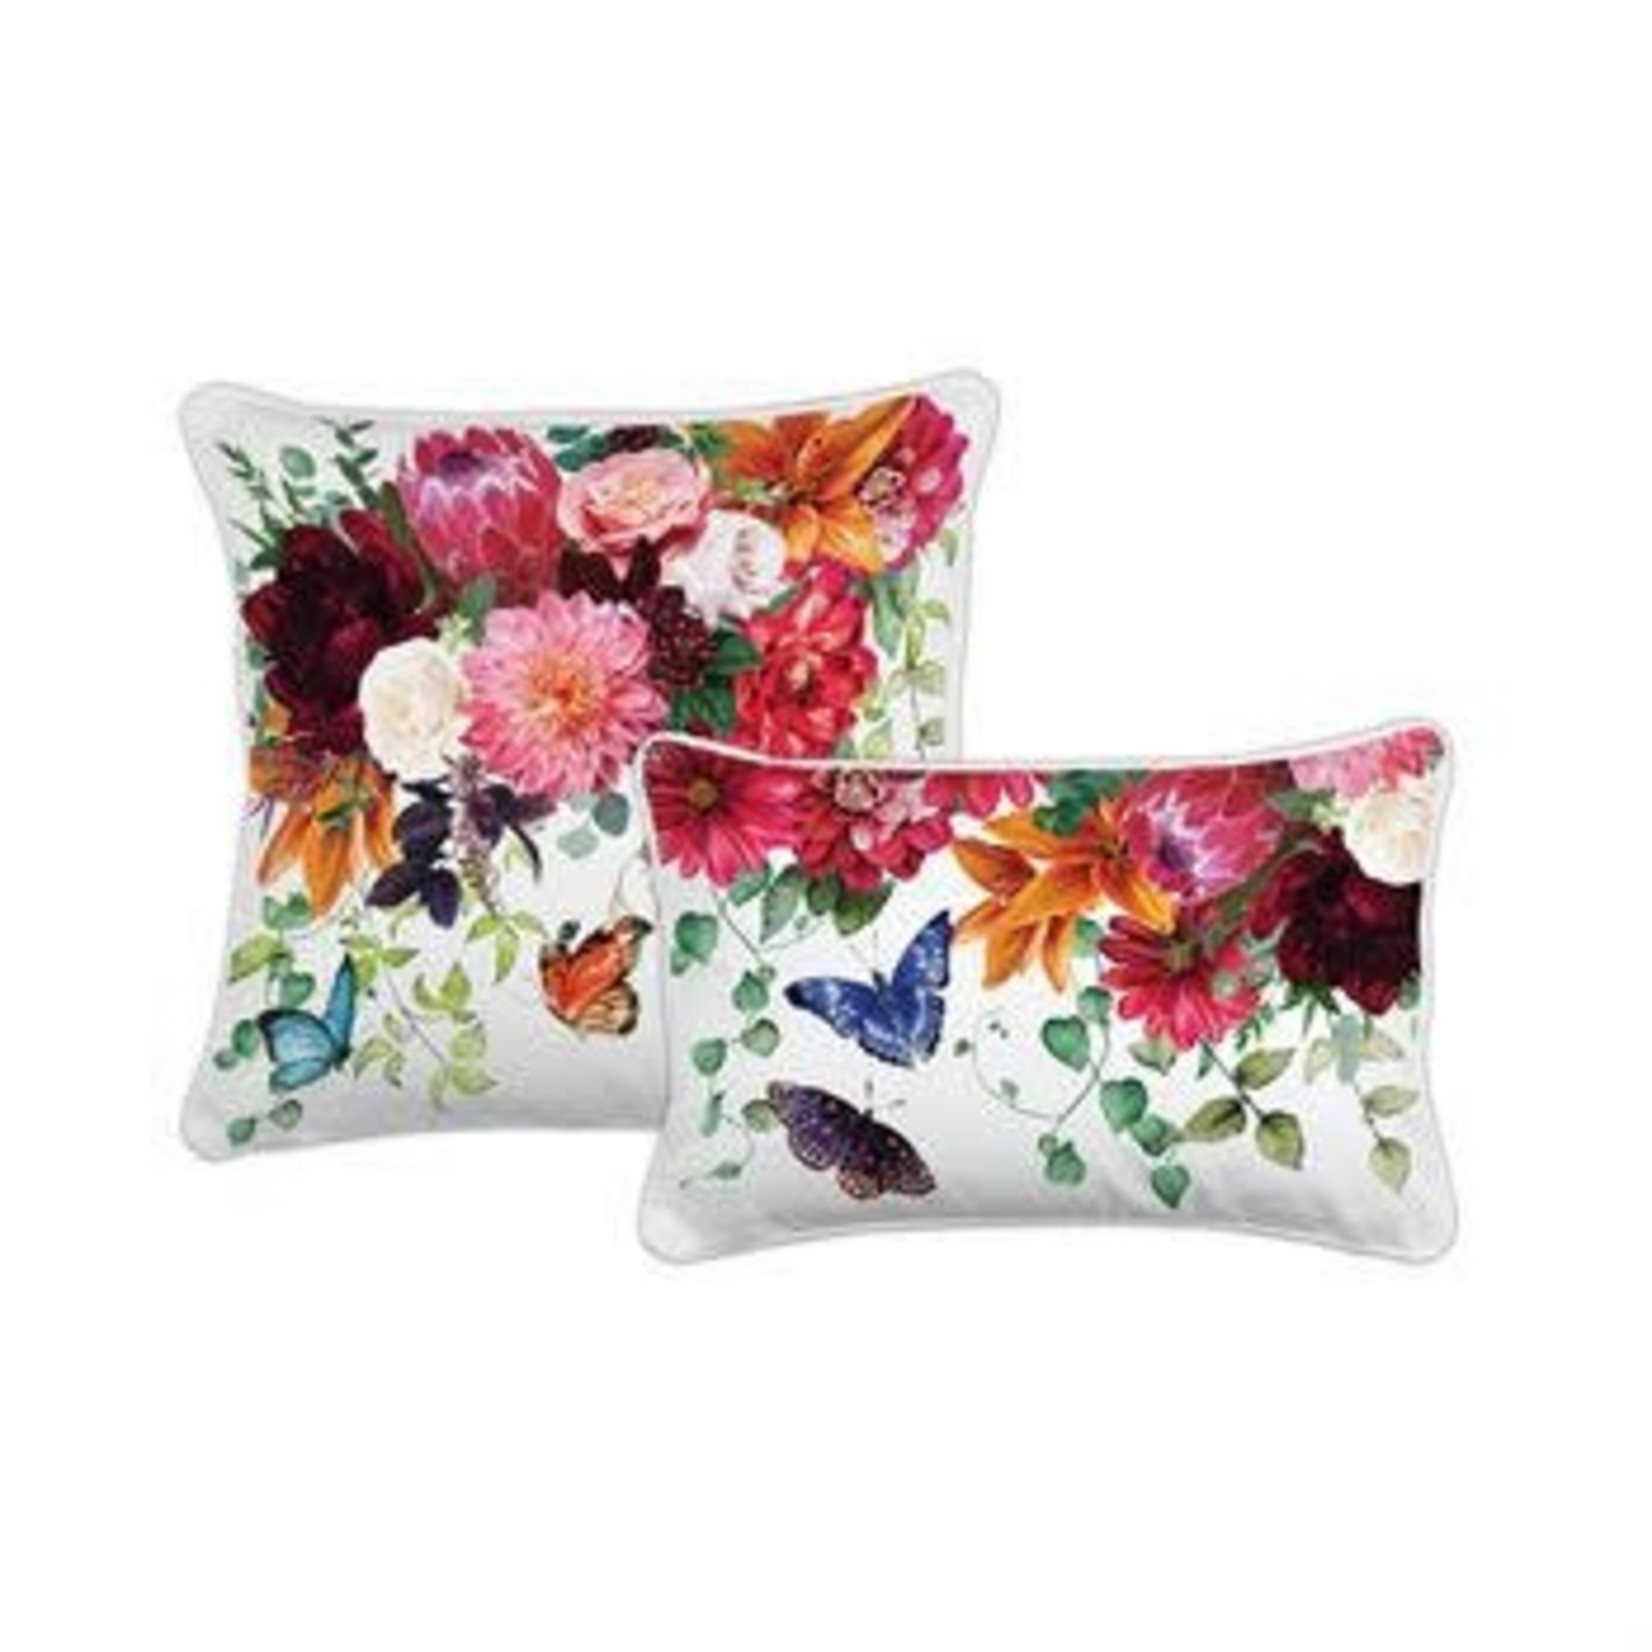 Michel Design Works Sweet Floral Melody Rectangular Pillow